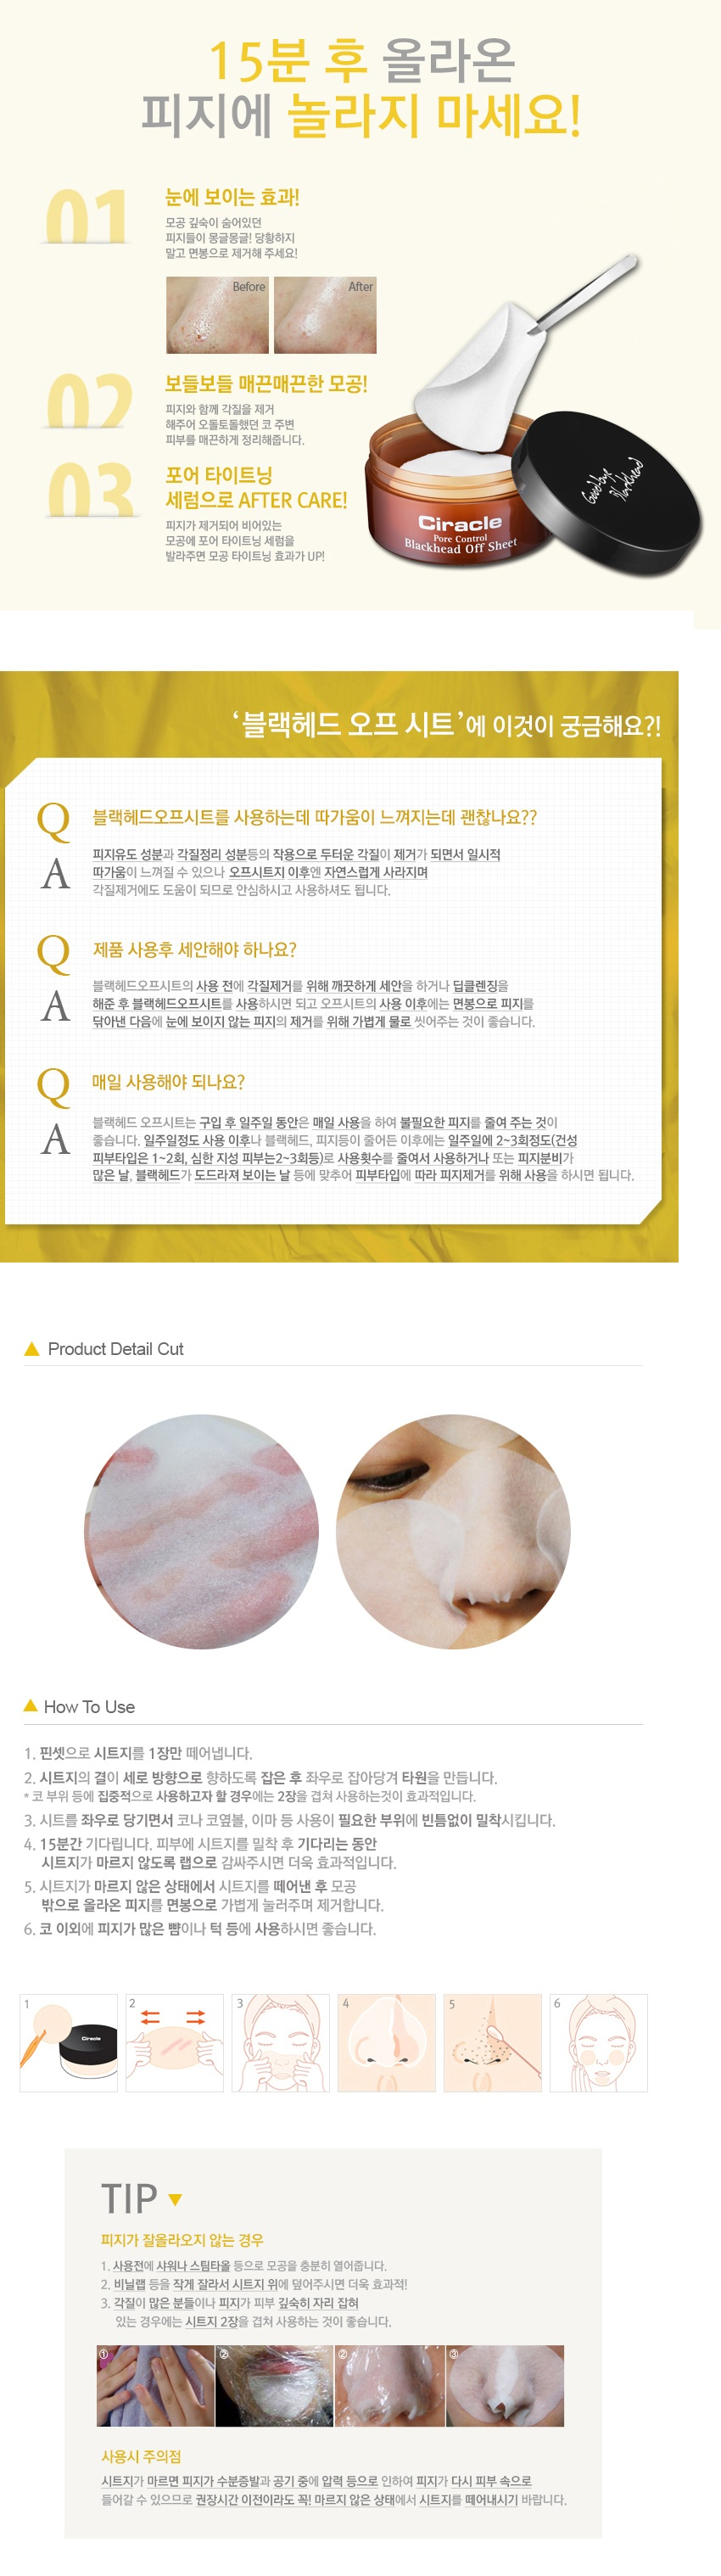 COSRX Ciracle Pore Control Blackhead Off Sheet korean cosmetic skincare product online shop malaysia malta serbia2